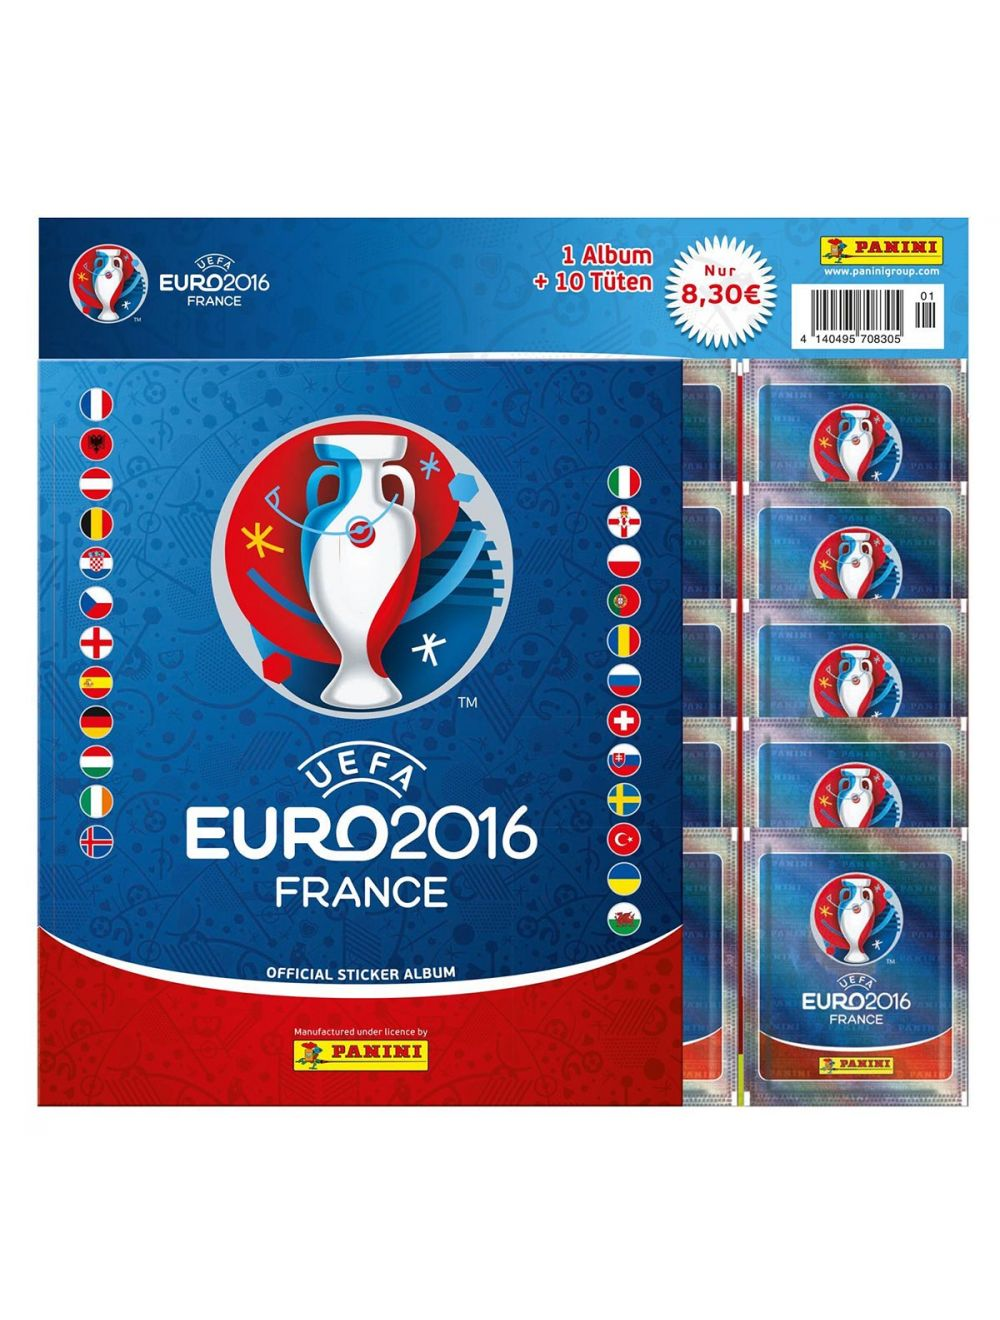 UEFA EURO 2016 Sticker Album + 10 Tüten Starter (DE) - Cardport Collectors'  Shop